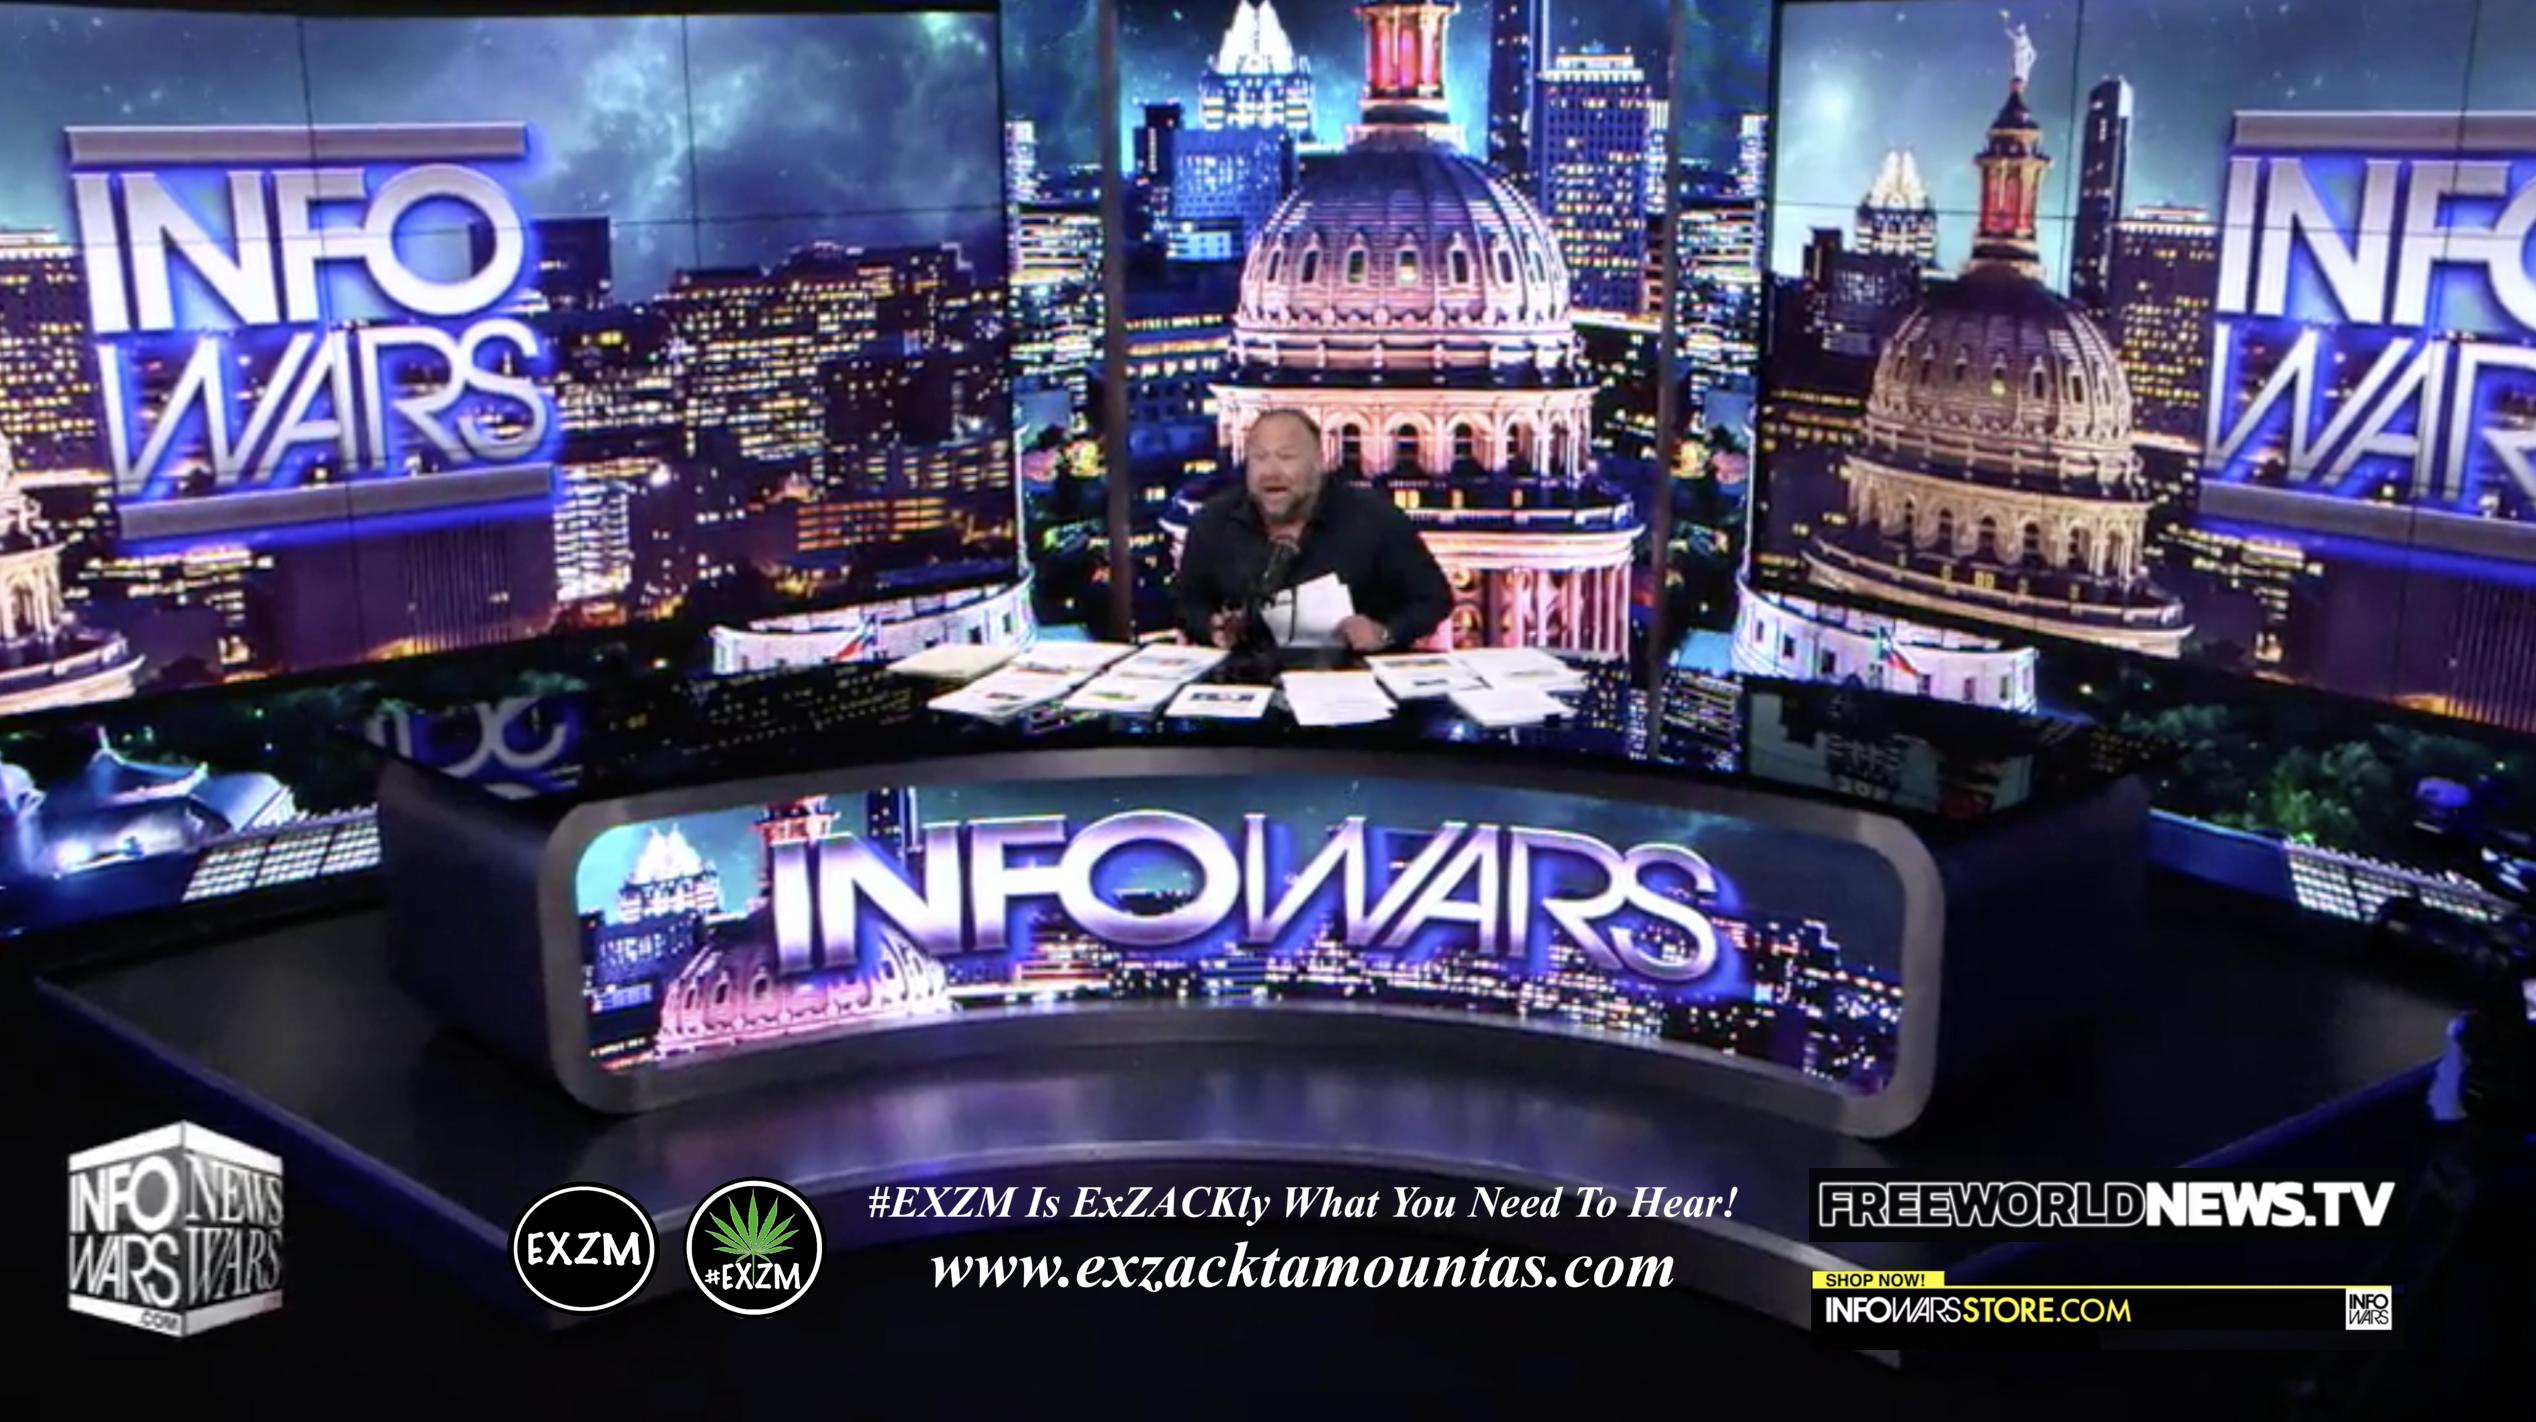 Alex Jones Live In Infowars Studio Free World News TV EXZM Zack Mount August 4th 2021 copy